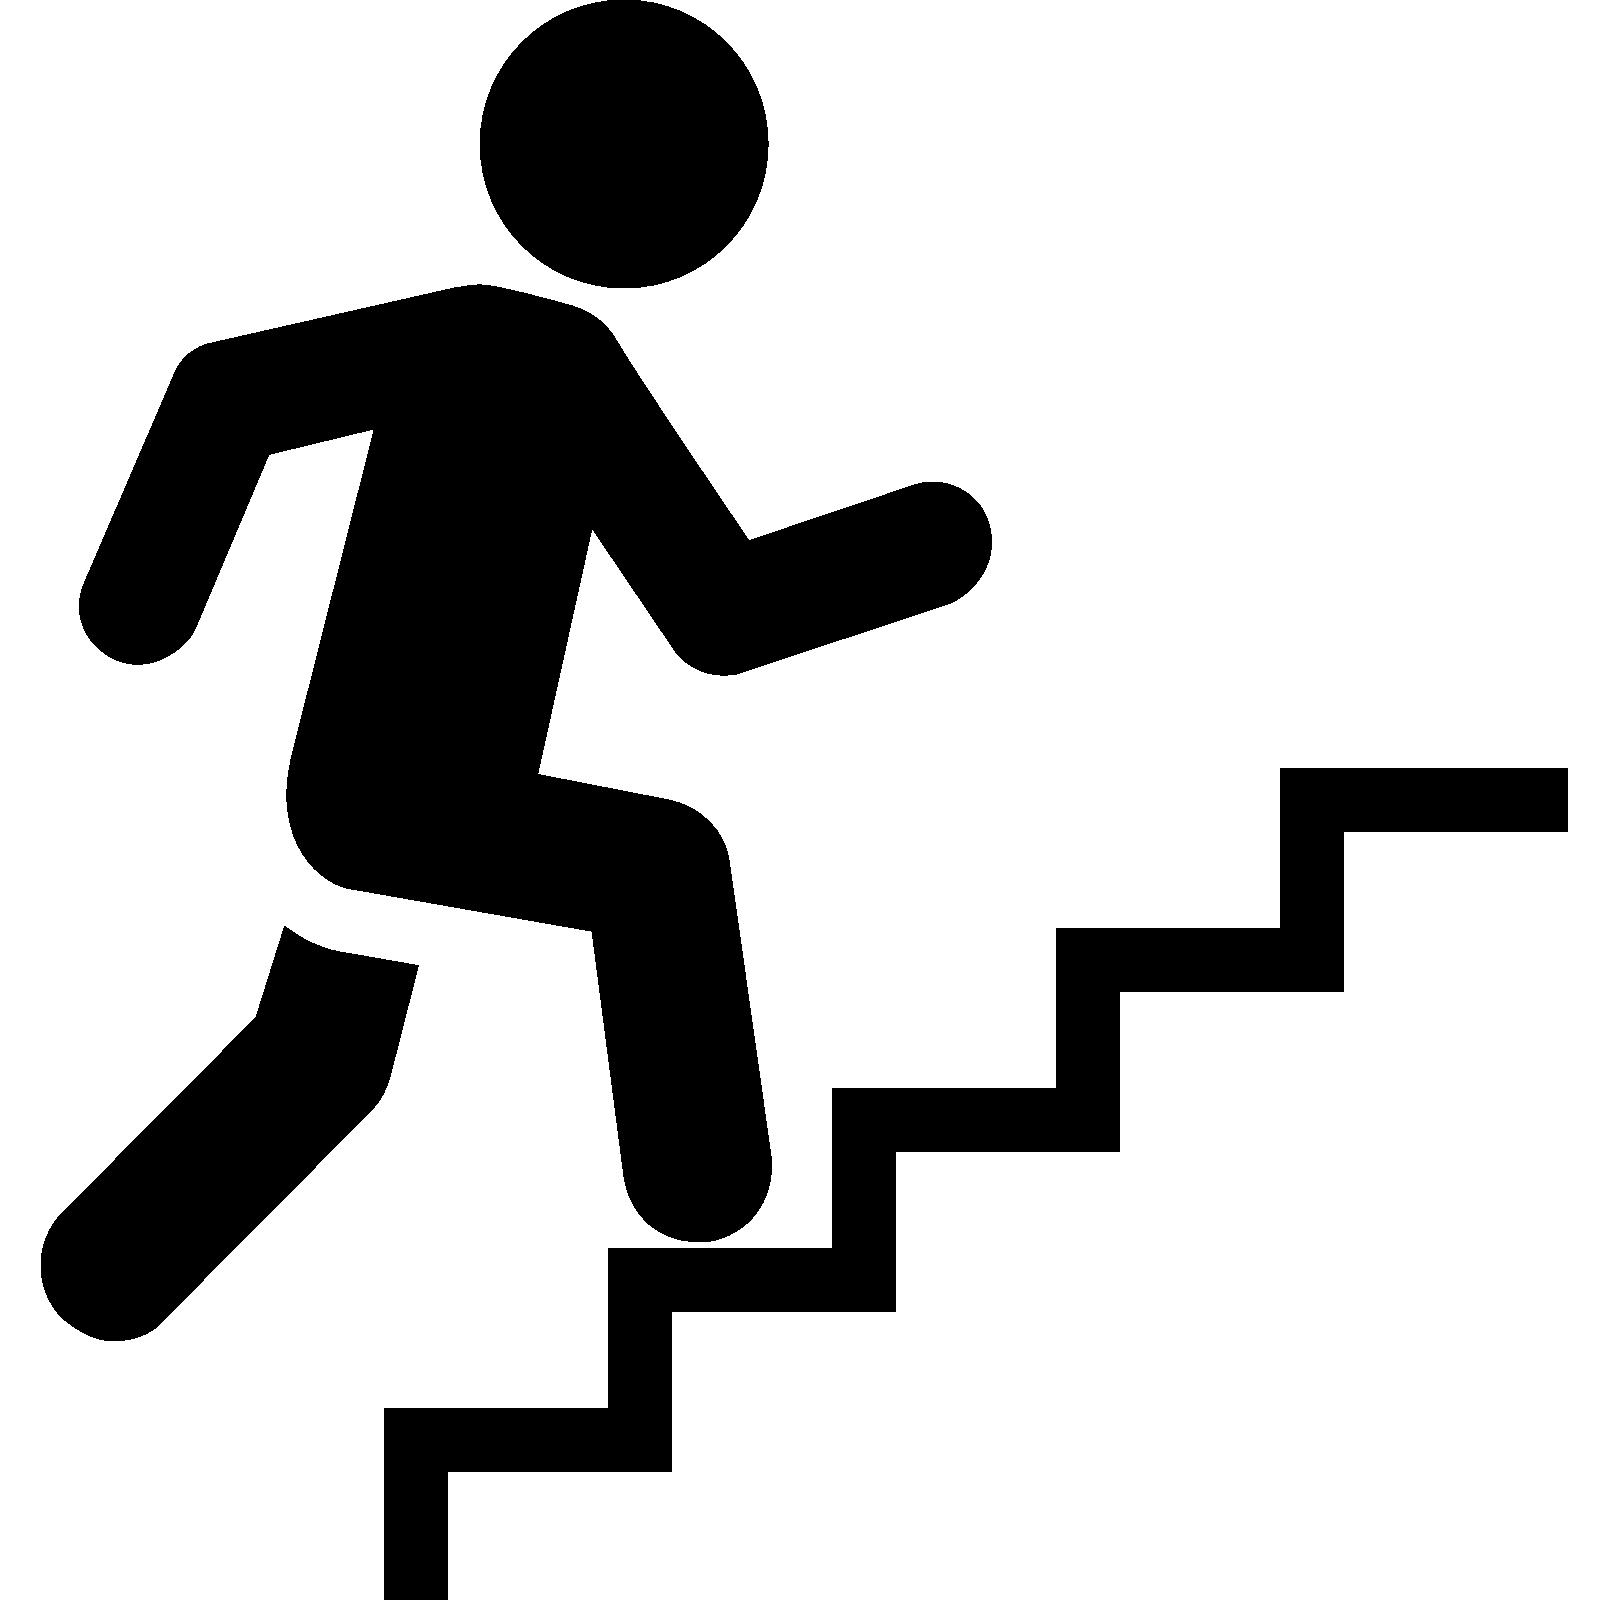 Stair Clipart.